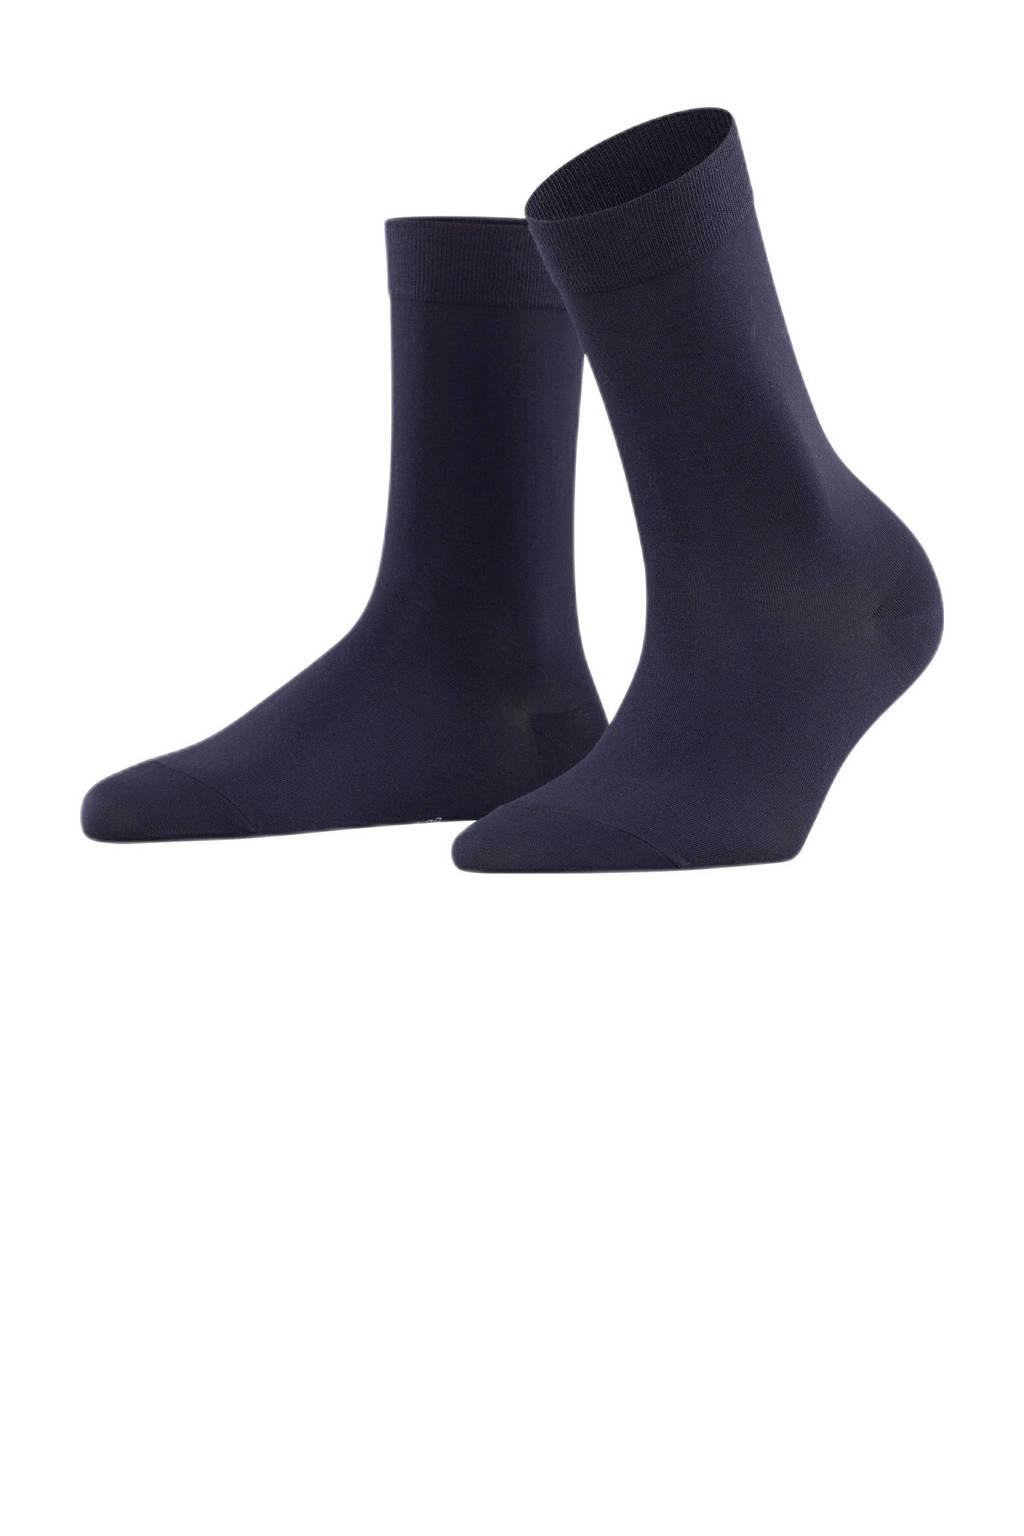 FALKE Cotton Touch sokken donkerblauw, Donkerblauw